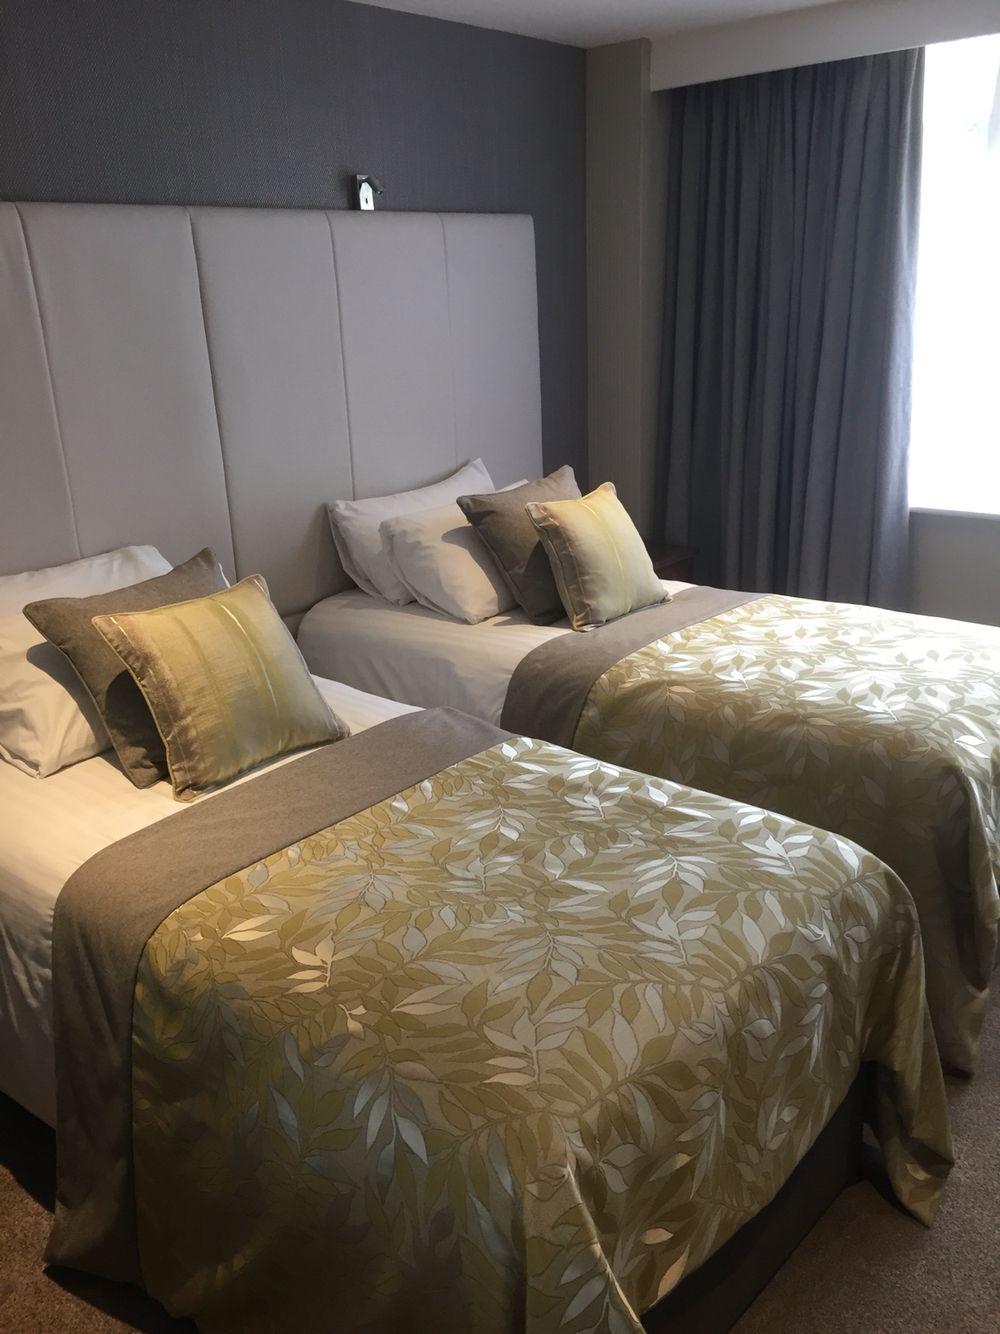 carol browne designs four seasons hotel monaghan new room refurb